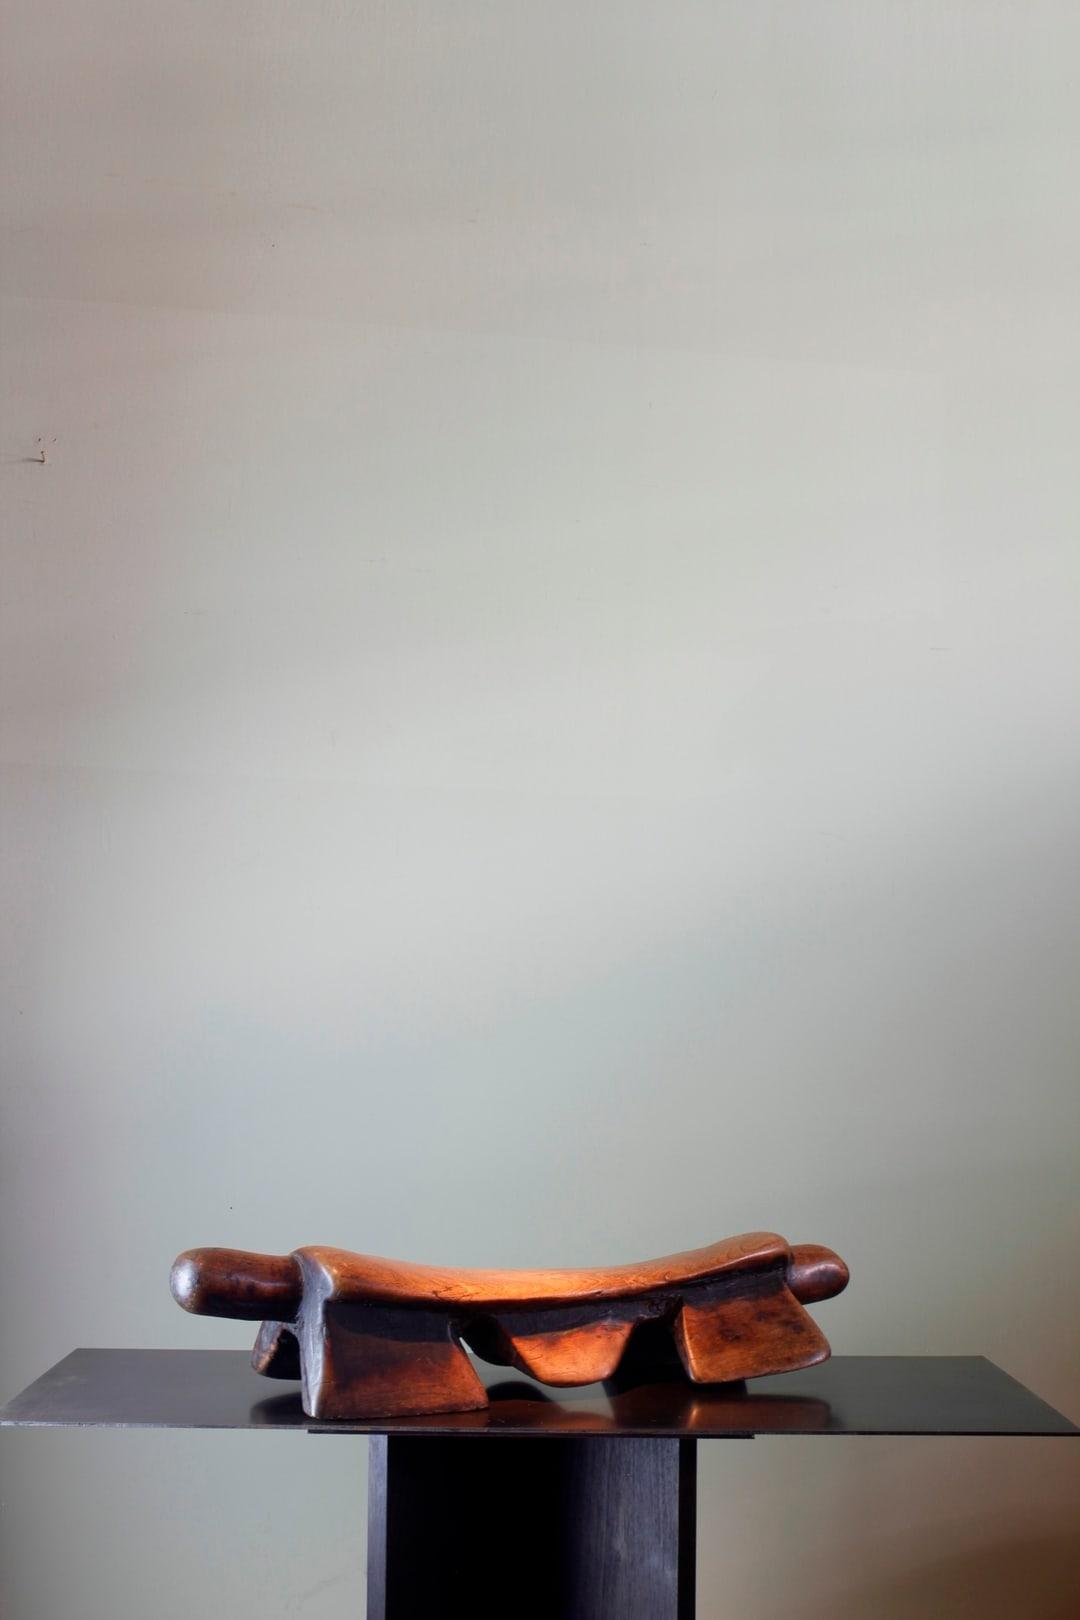 1. Headrest/Stool